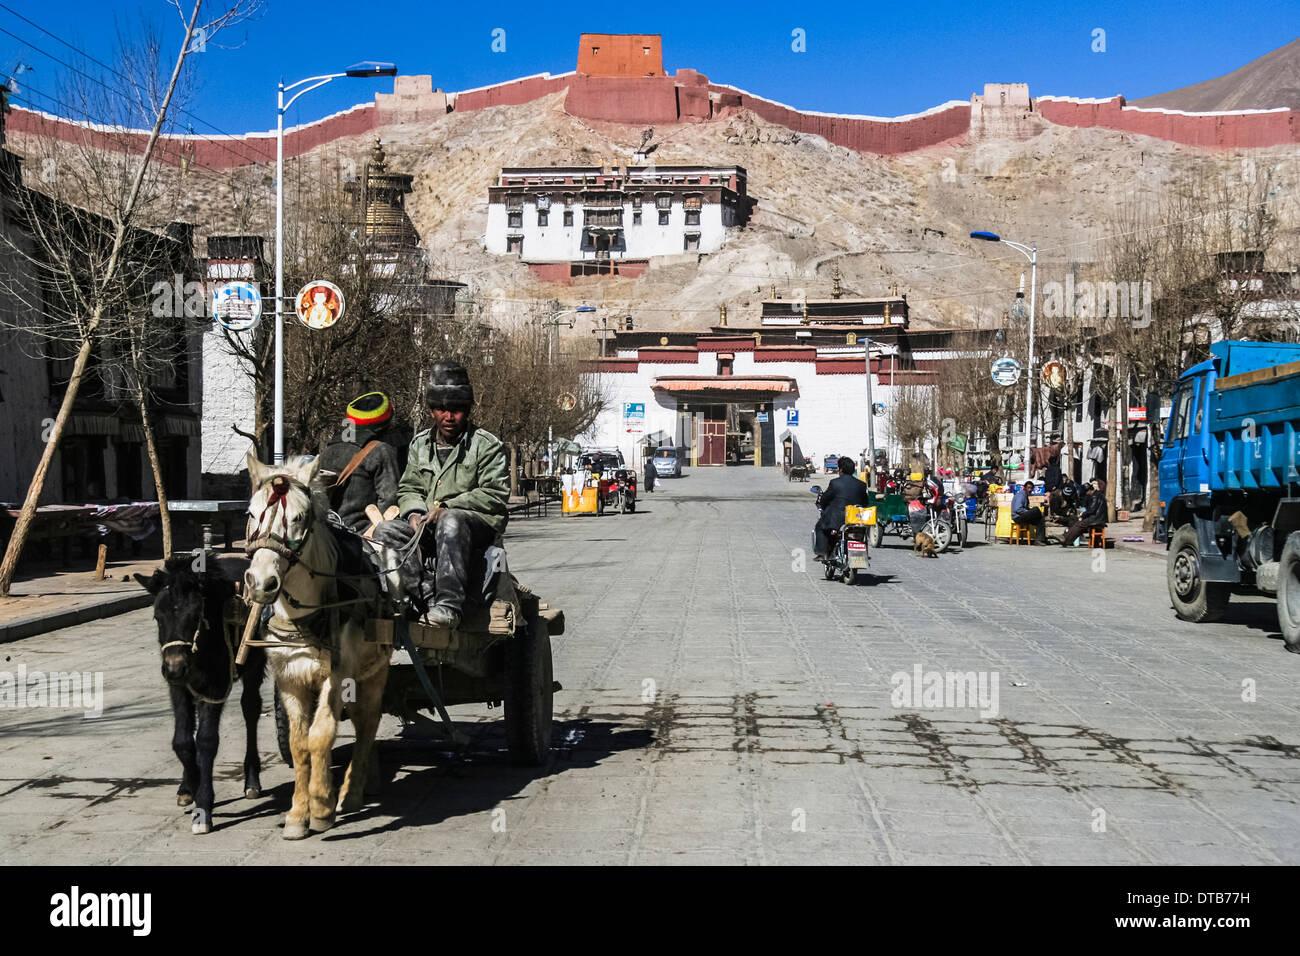 Street scene with Pelkor Chode Monastery, Gyantse, Tibet - Stock Image